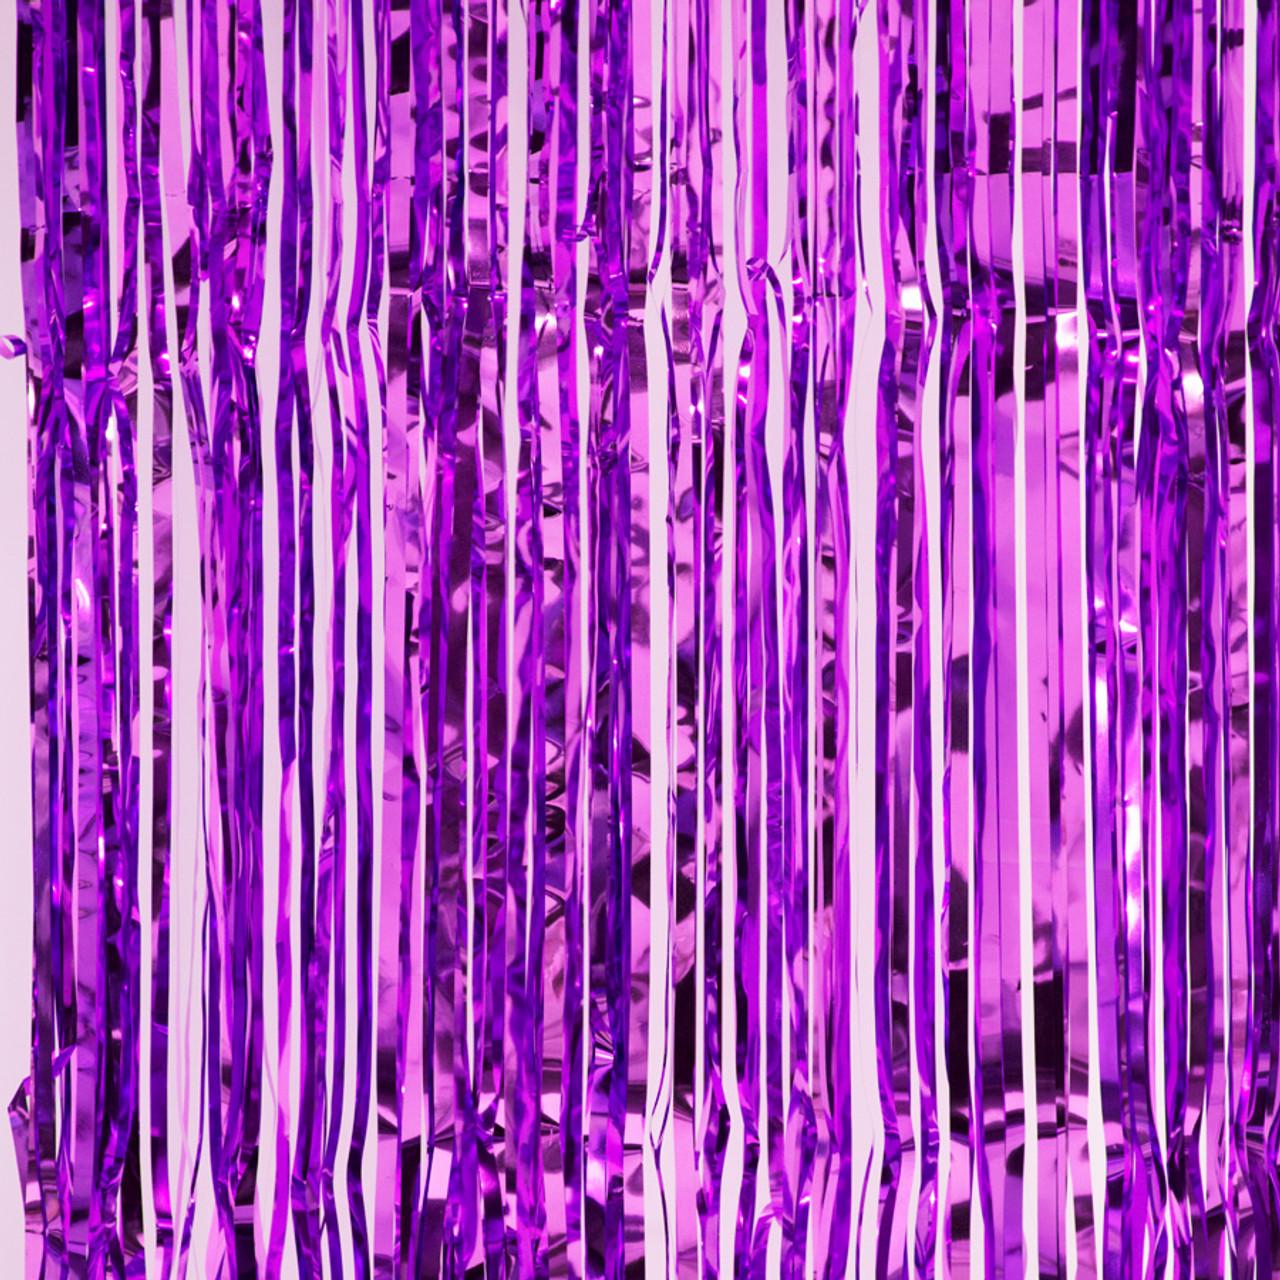 metallic foil fringe curtain purple 8